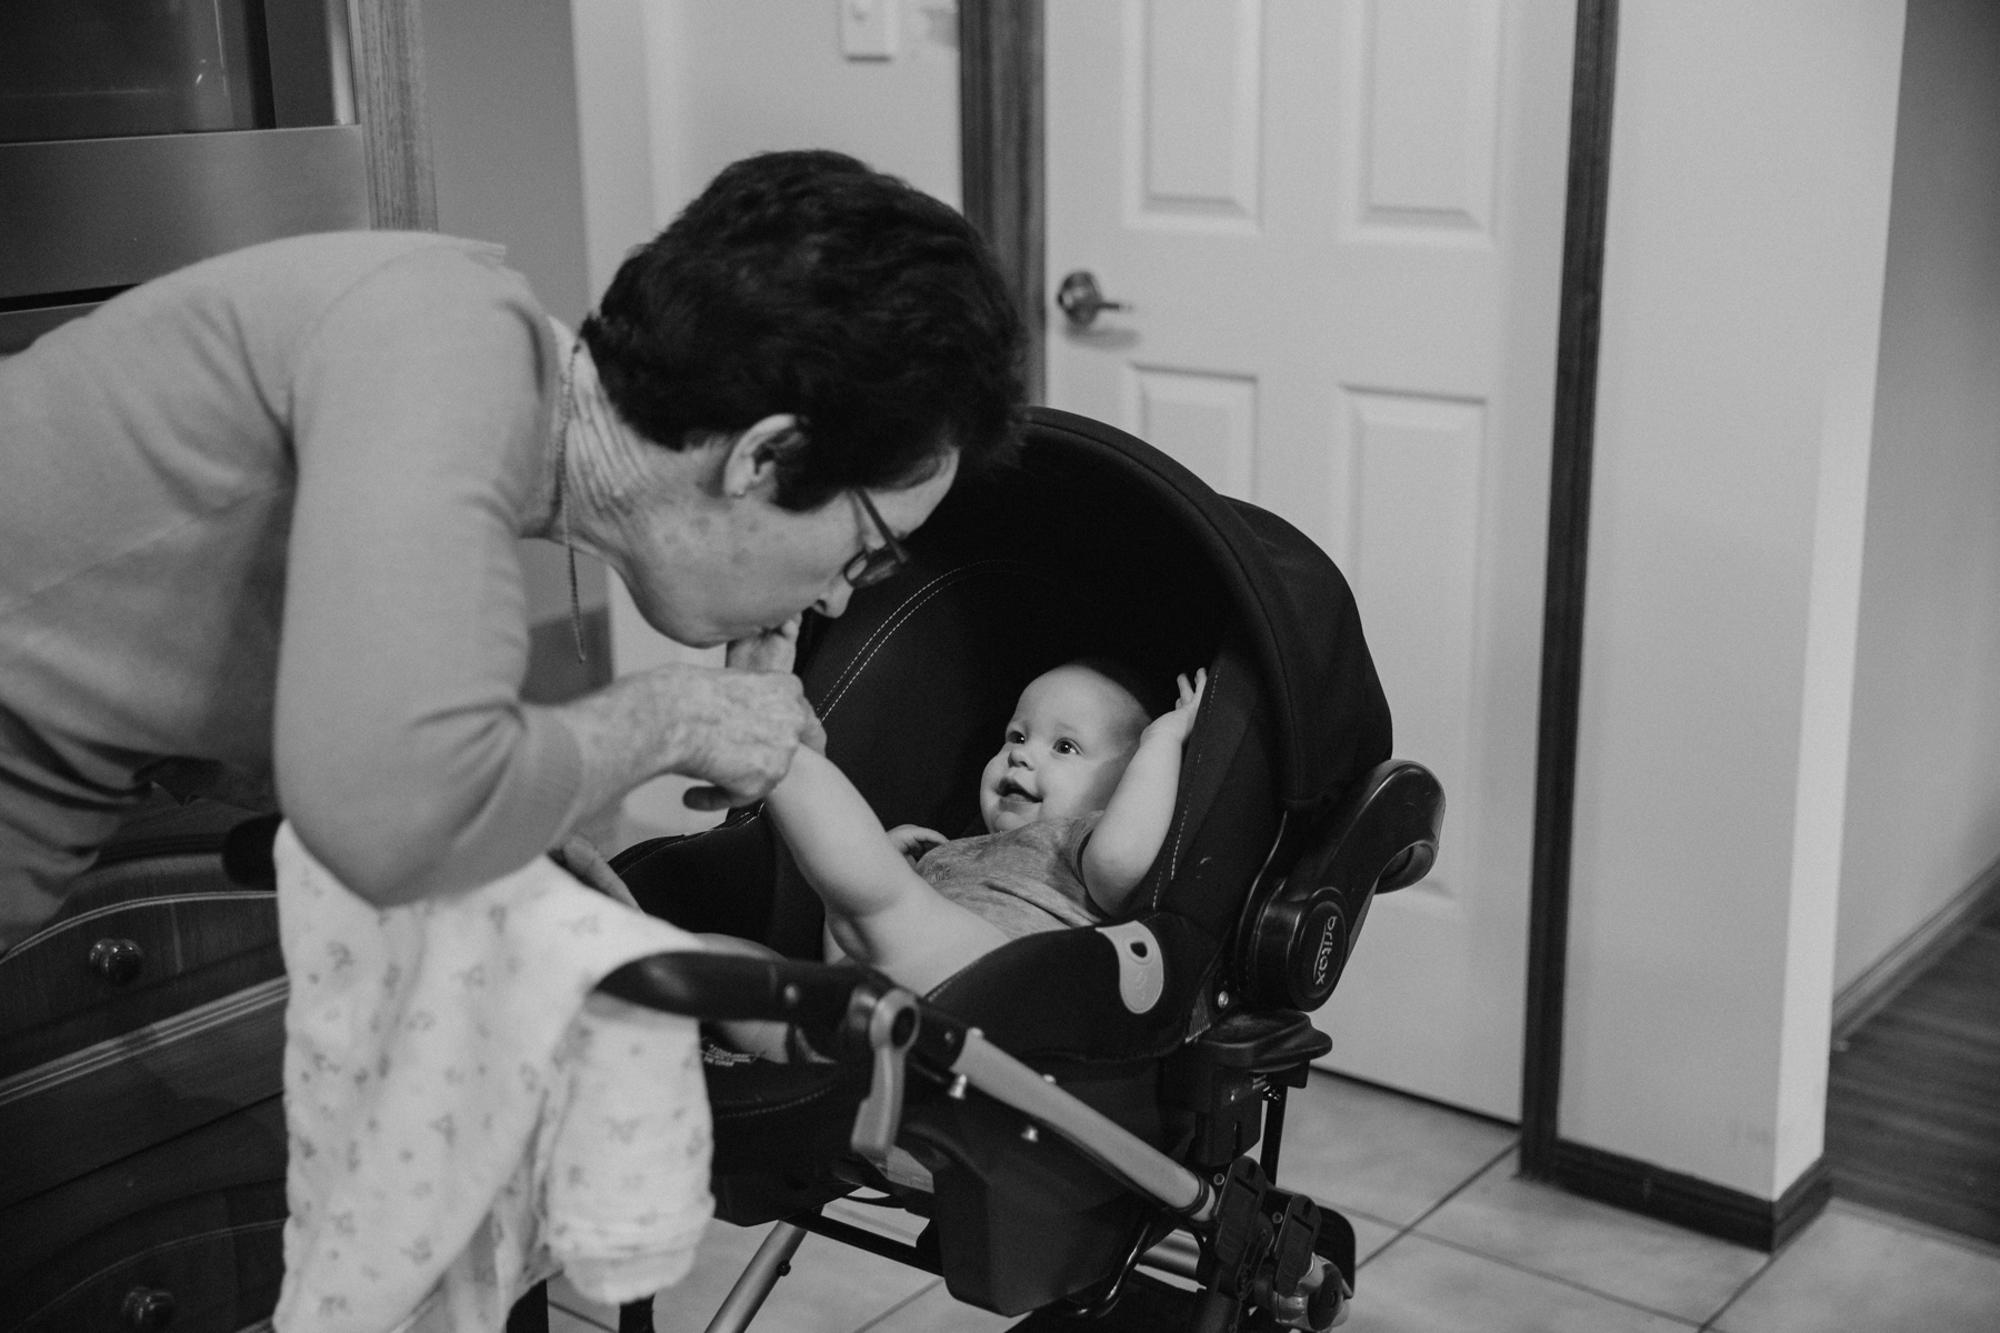 family-documentary-photo-016.JPG